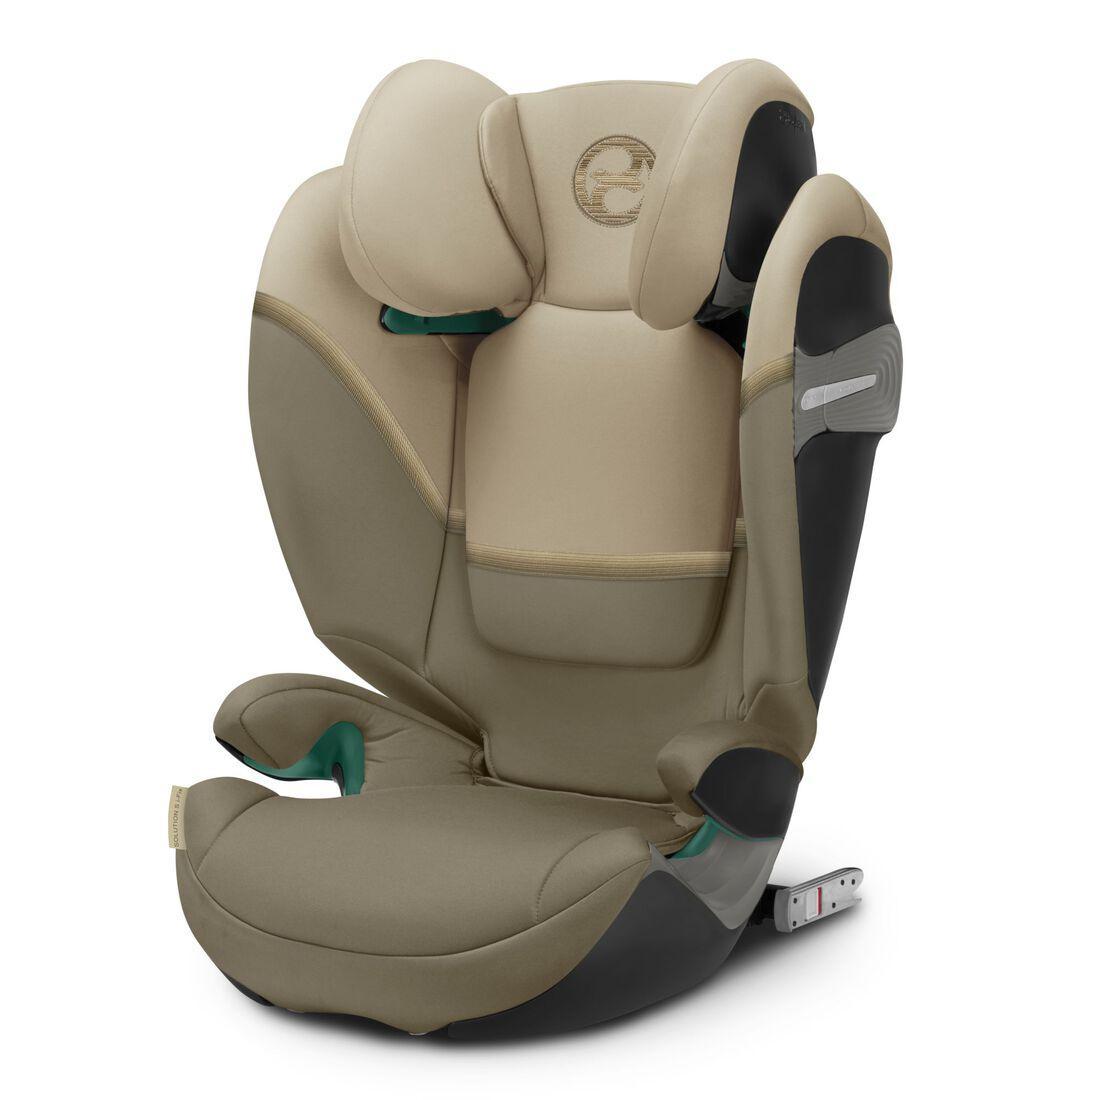 Cybex - Автокресло Solution S i-fix, цвет Classic Beige mid beige